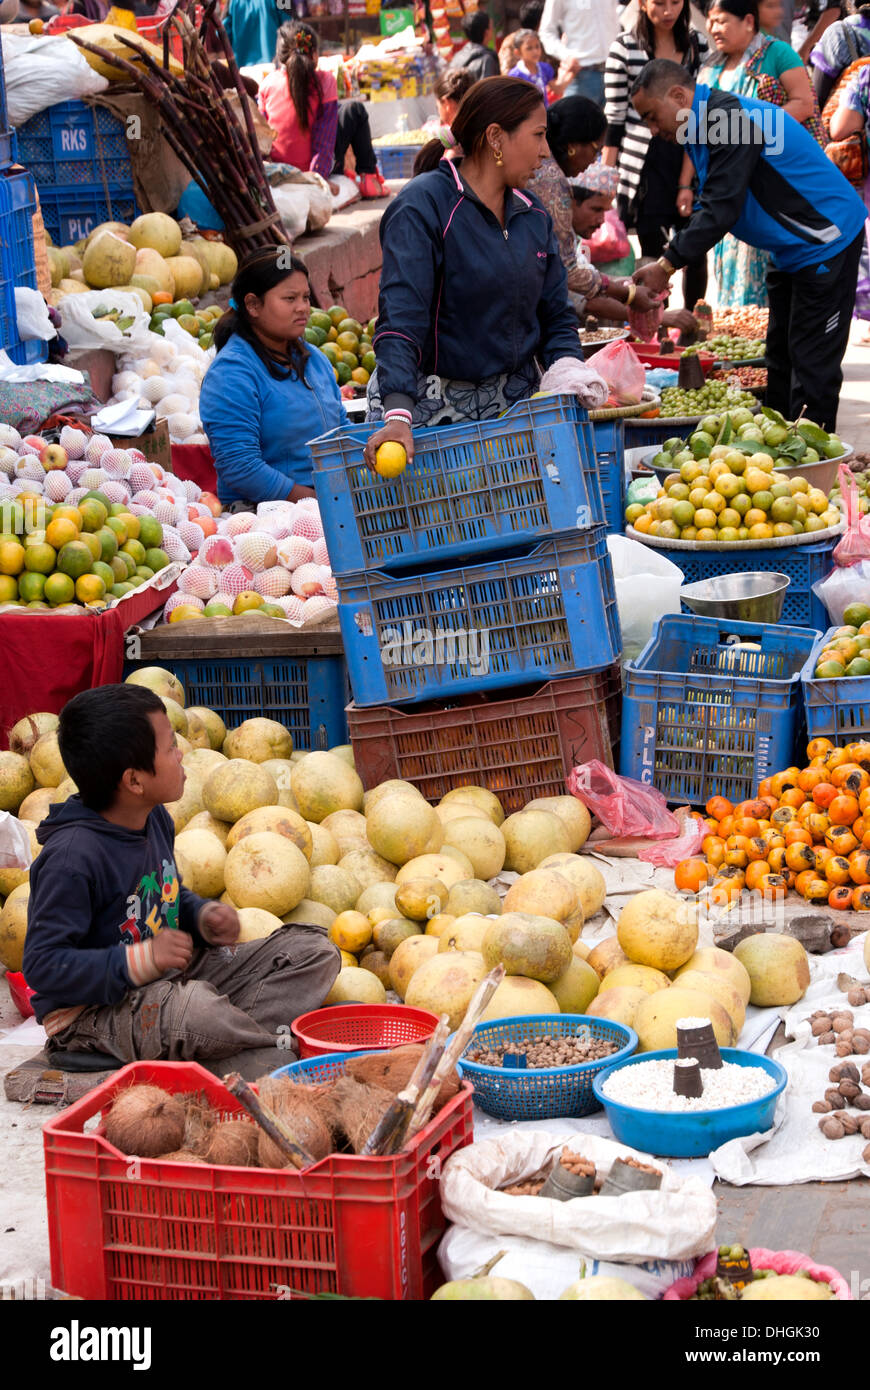 Fruit seller in Kathmandu, Nepal. - Stock Image